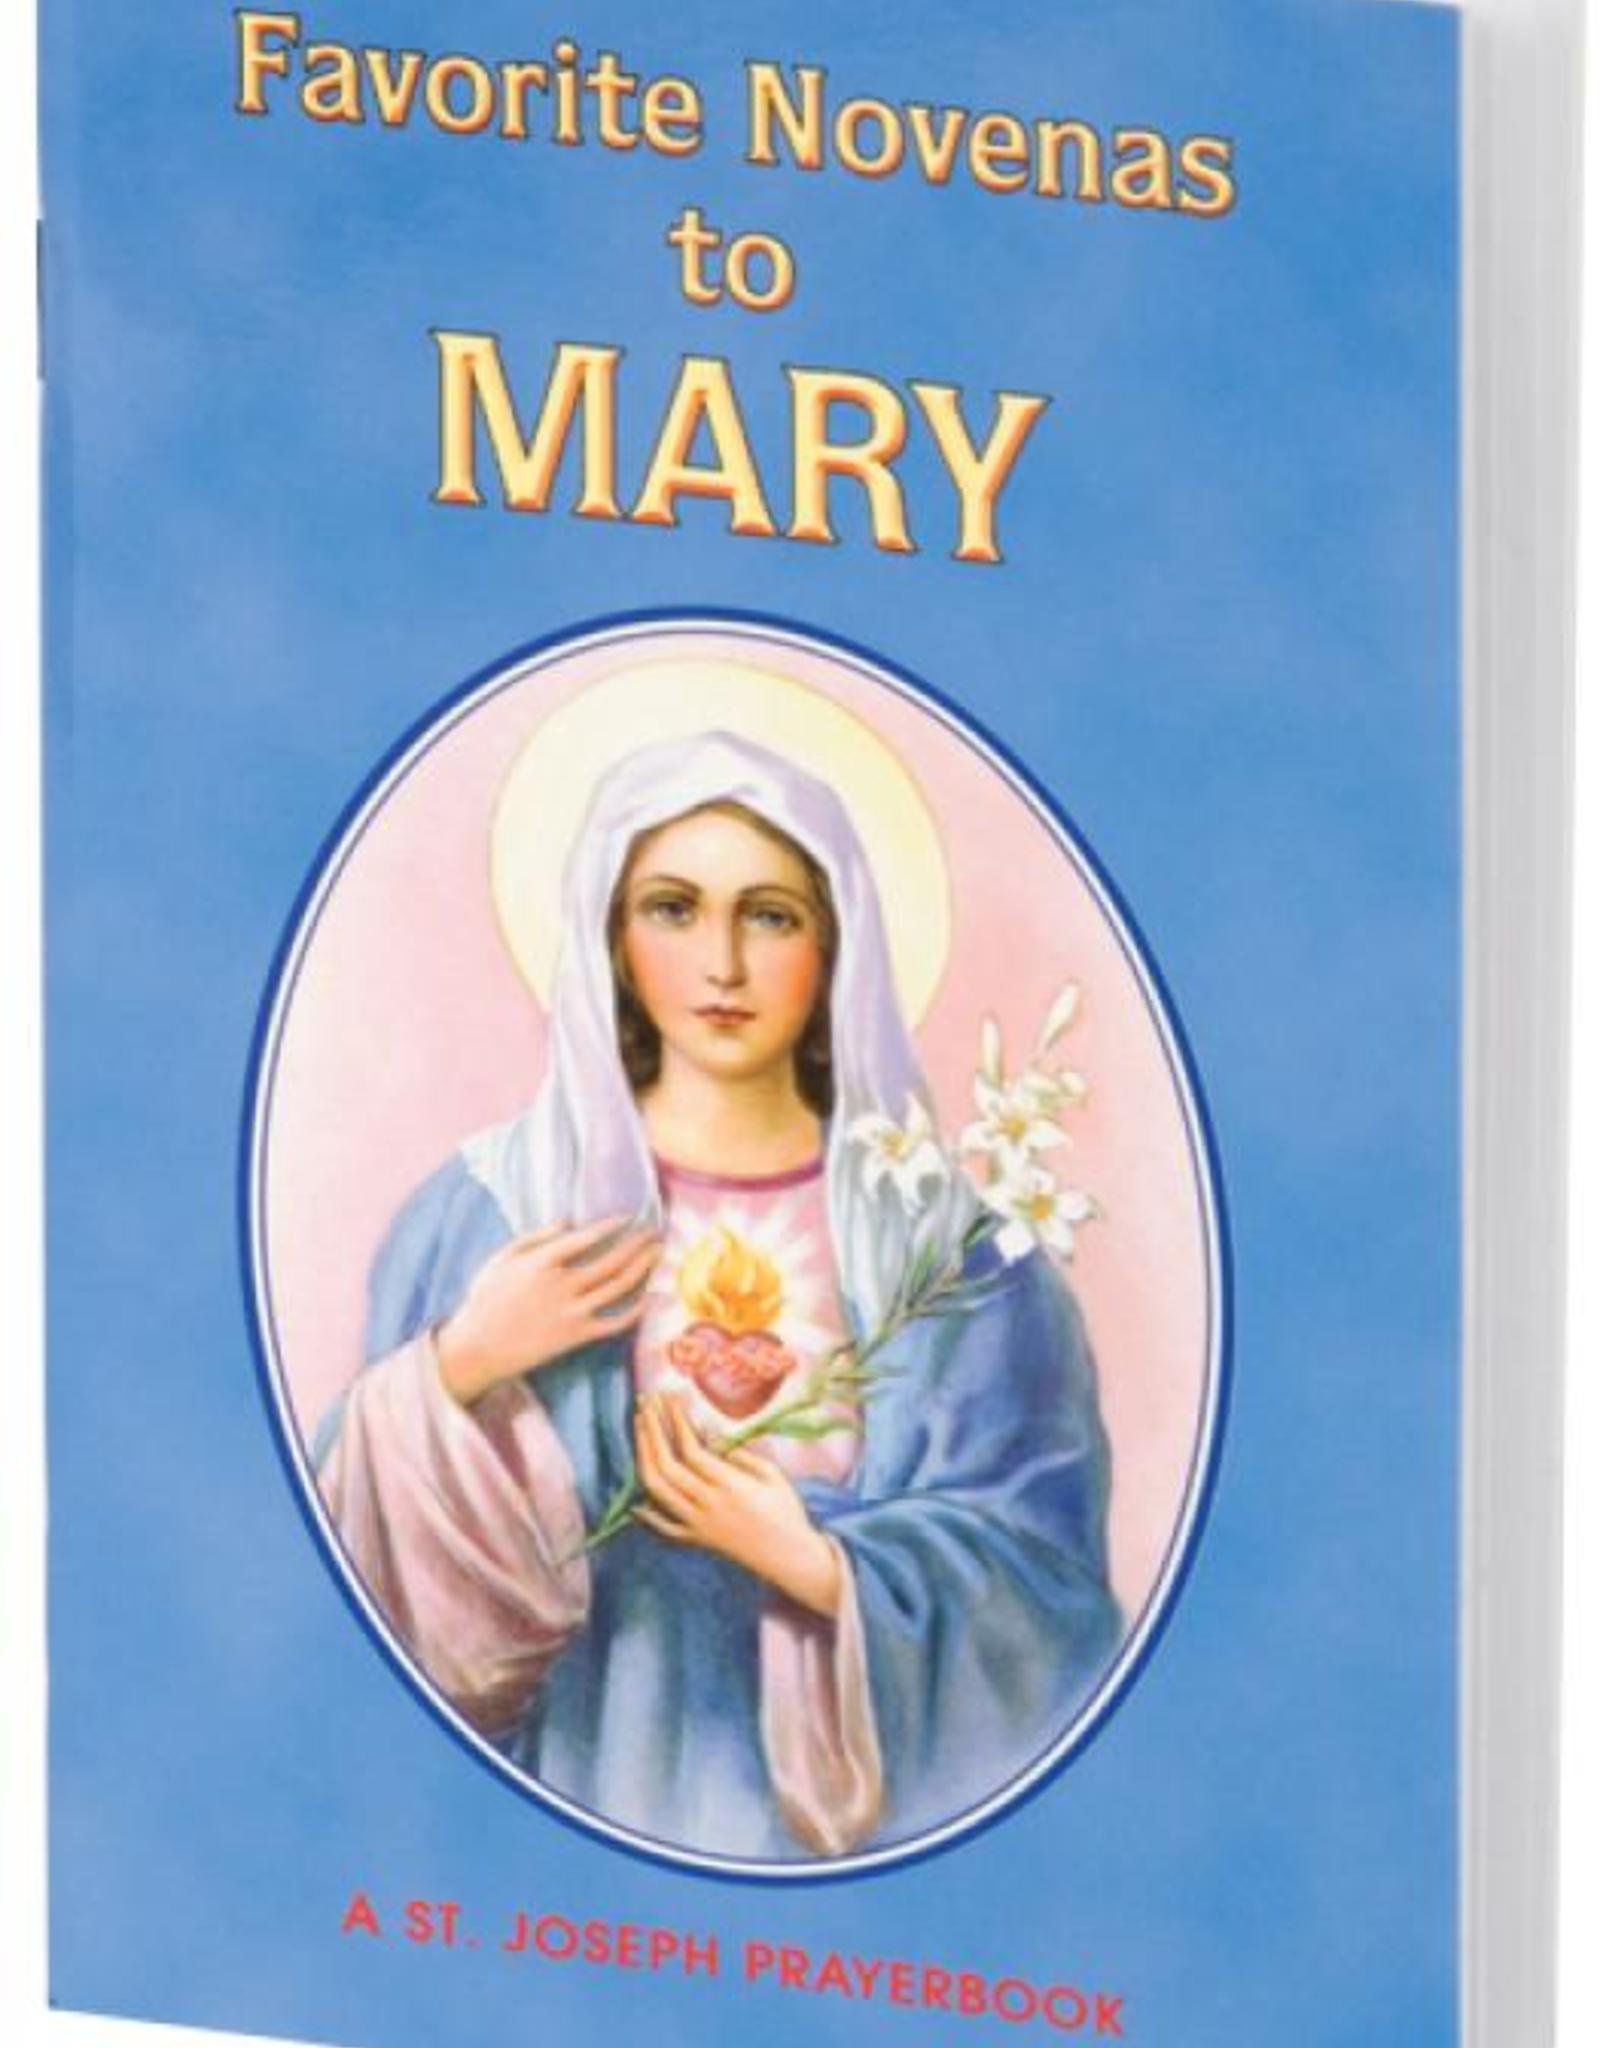 Catholic Book Publishing Favorite Novenas to Mary, by Rev. Lawrence Lovasik